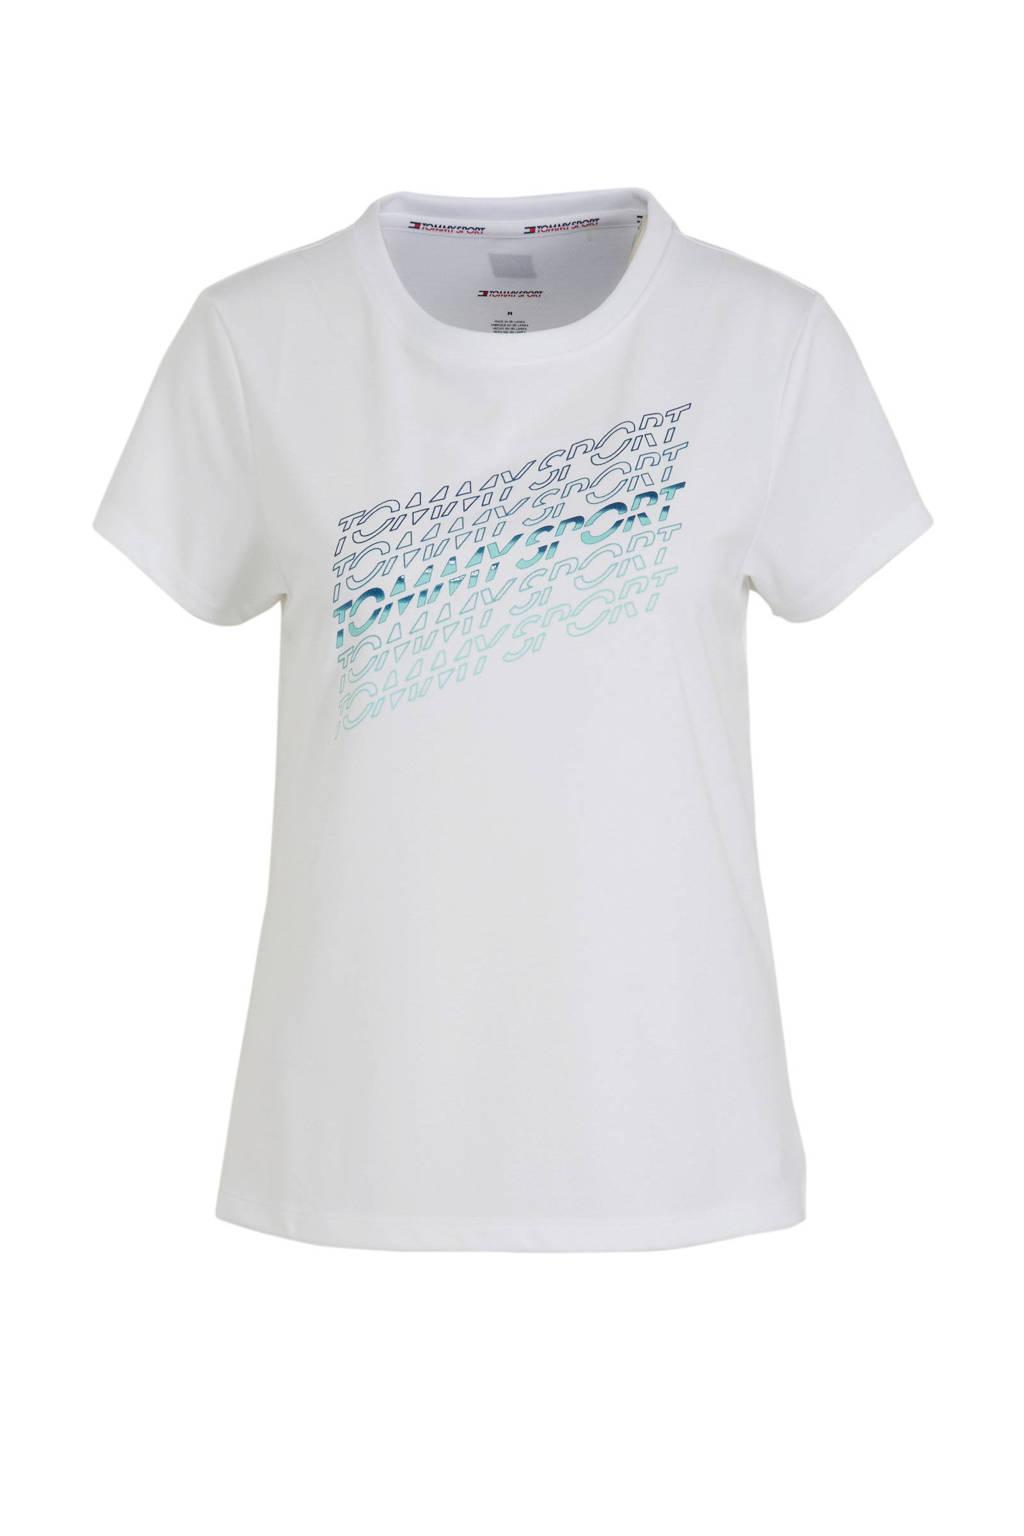 Tommy Hilfiger Sport T-shirt wit, Wit